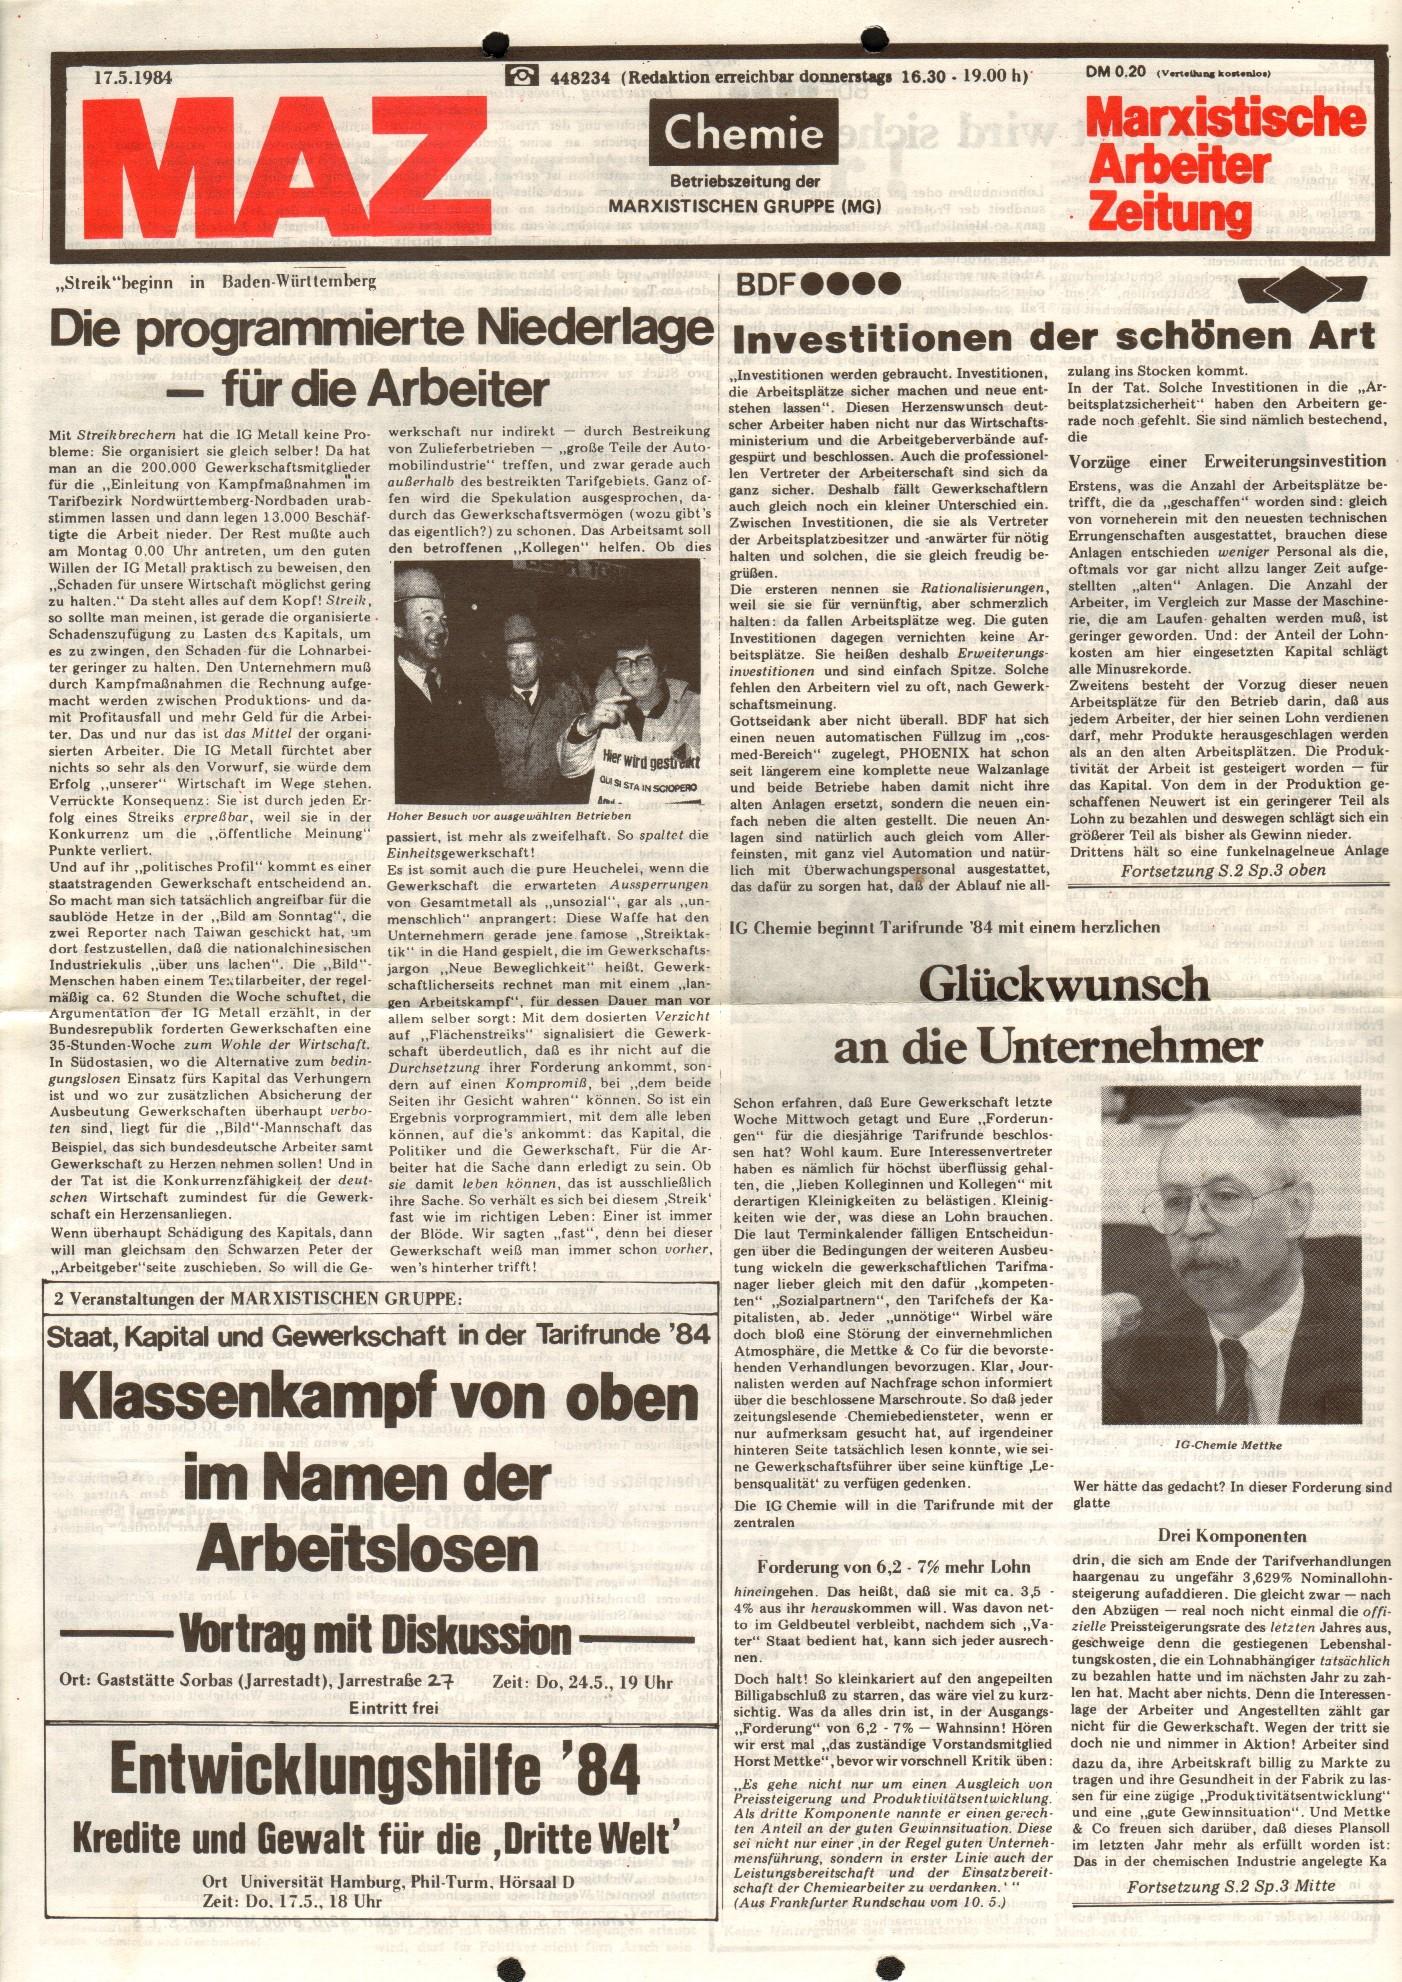 Hamburg_MG_MAZ_Chemie_19840517_01